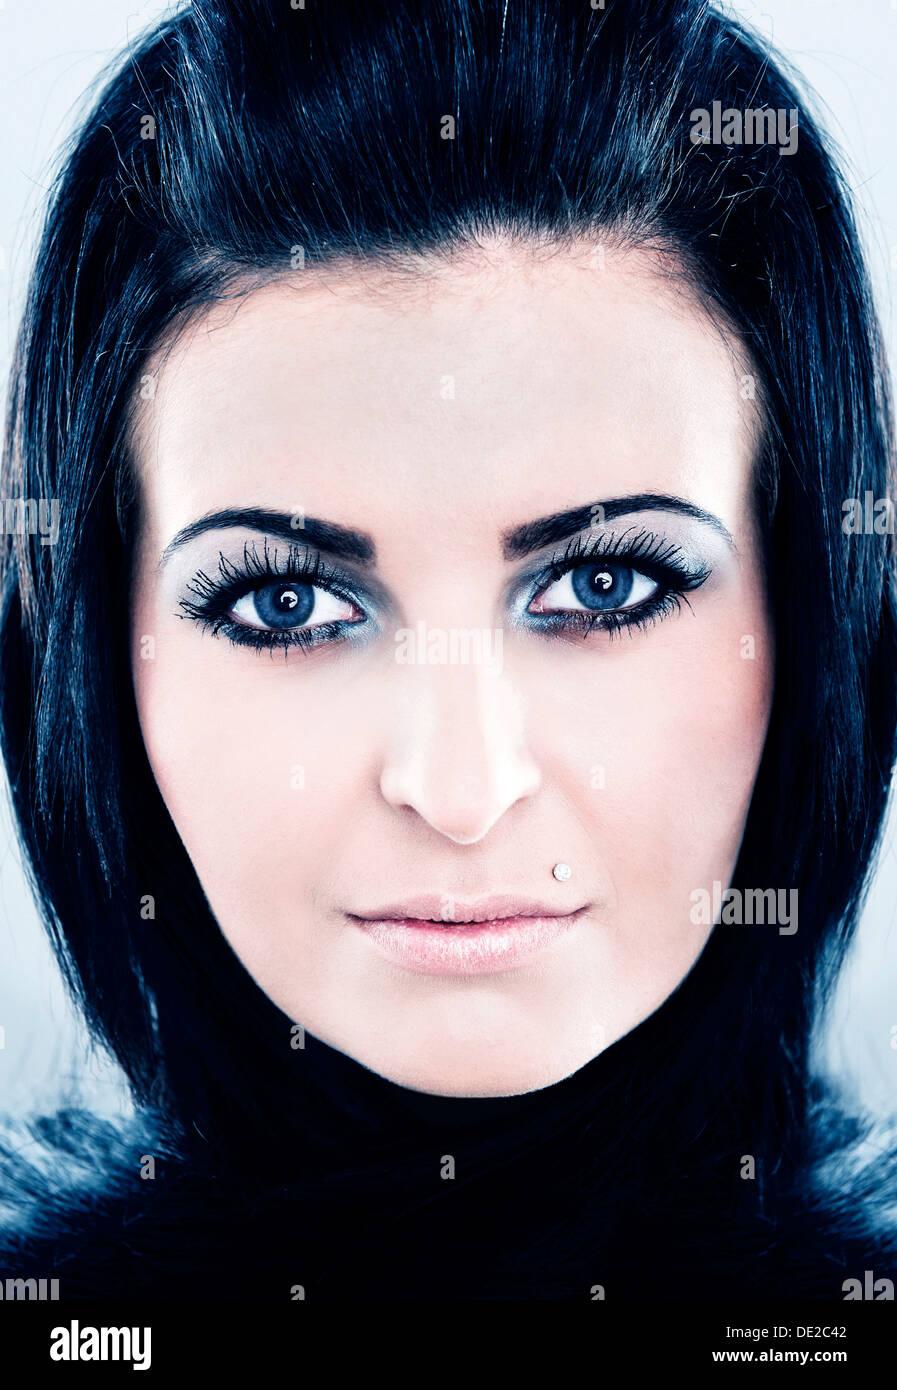 Schwarze Haare blaue Augen von Website